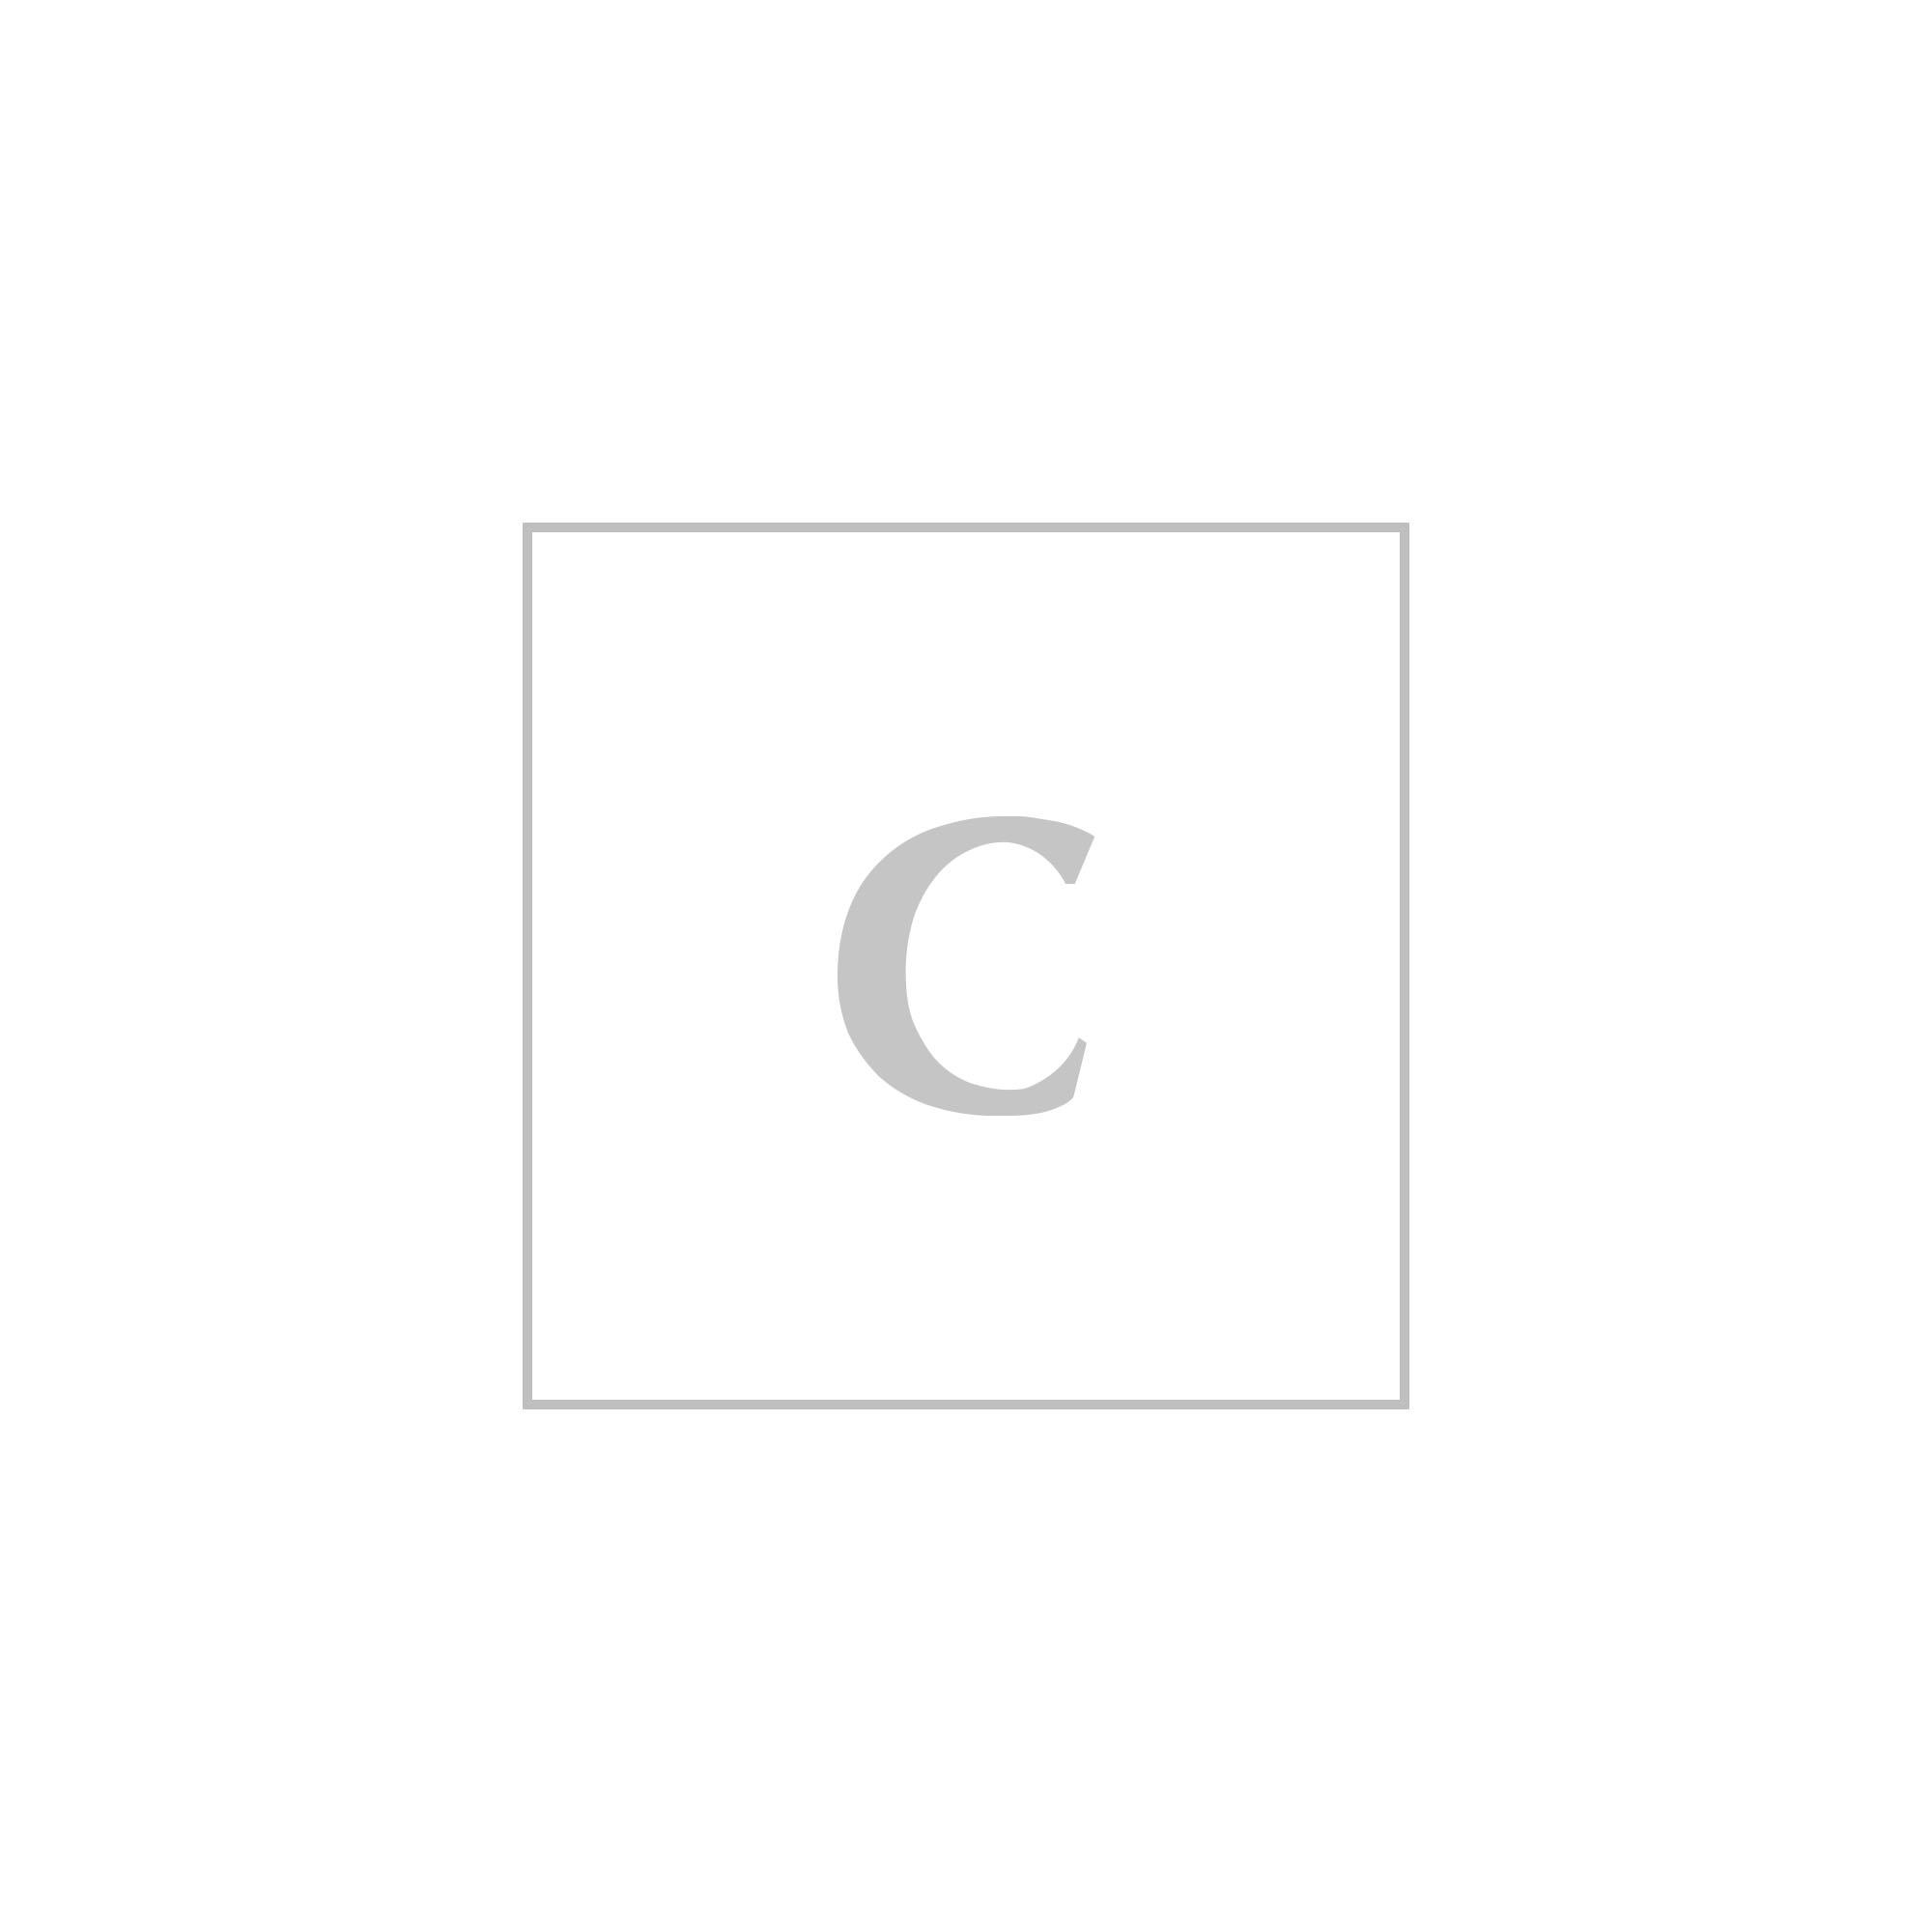 29ffb3c5b94e Moncler new logo knit beanie